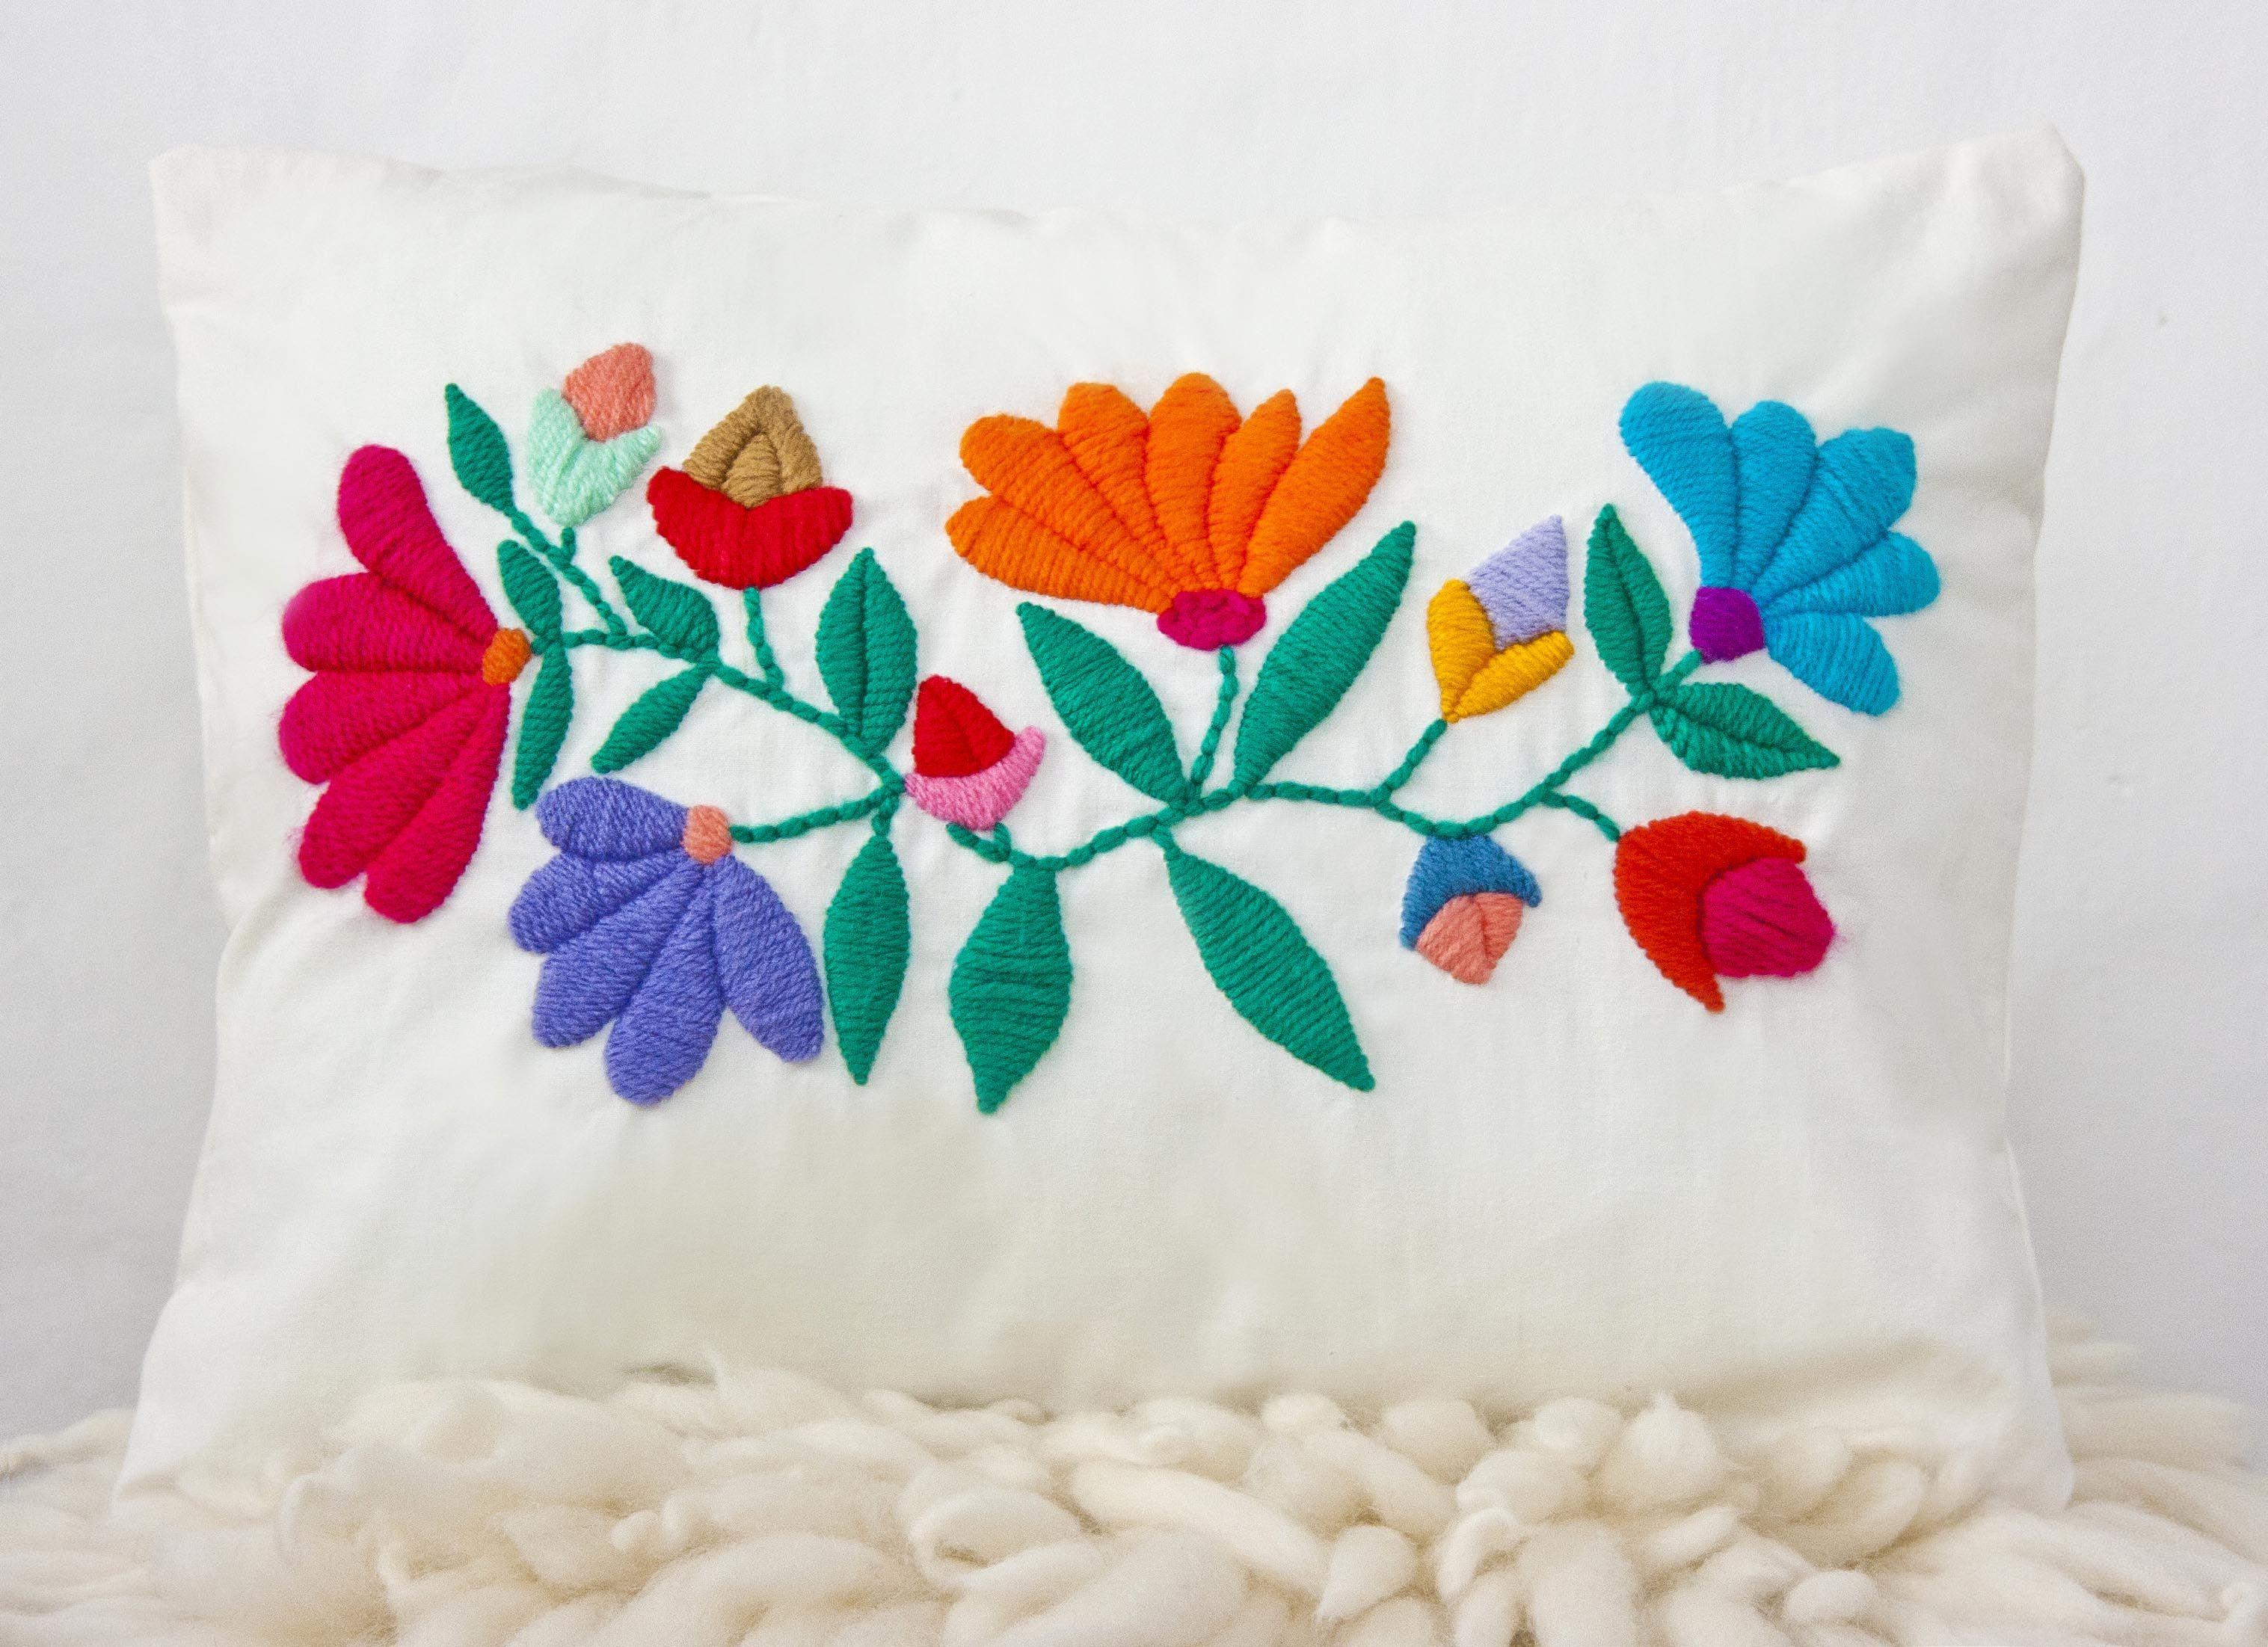 Almohadón de algodón bordado a mano. Medidas: 40x30 cm Peso: 300gr ...